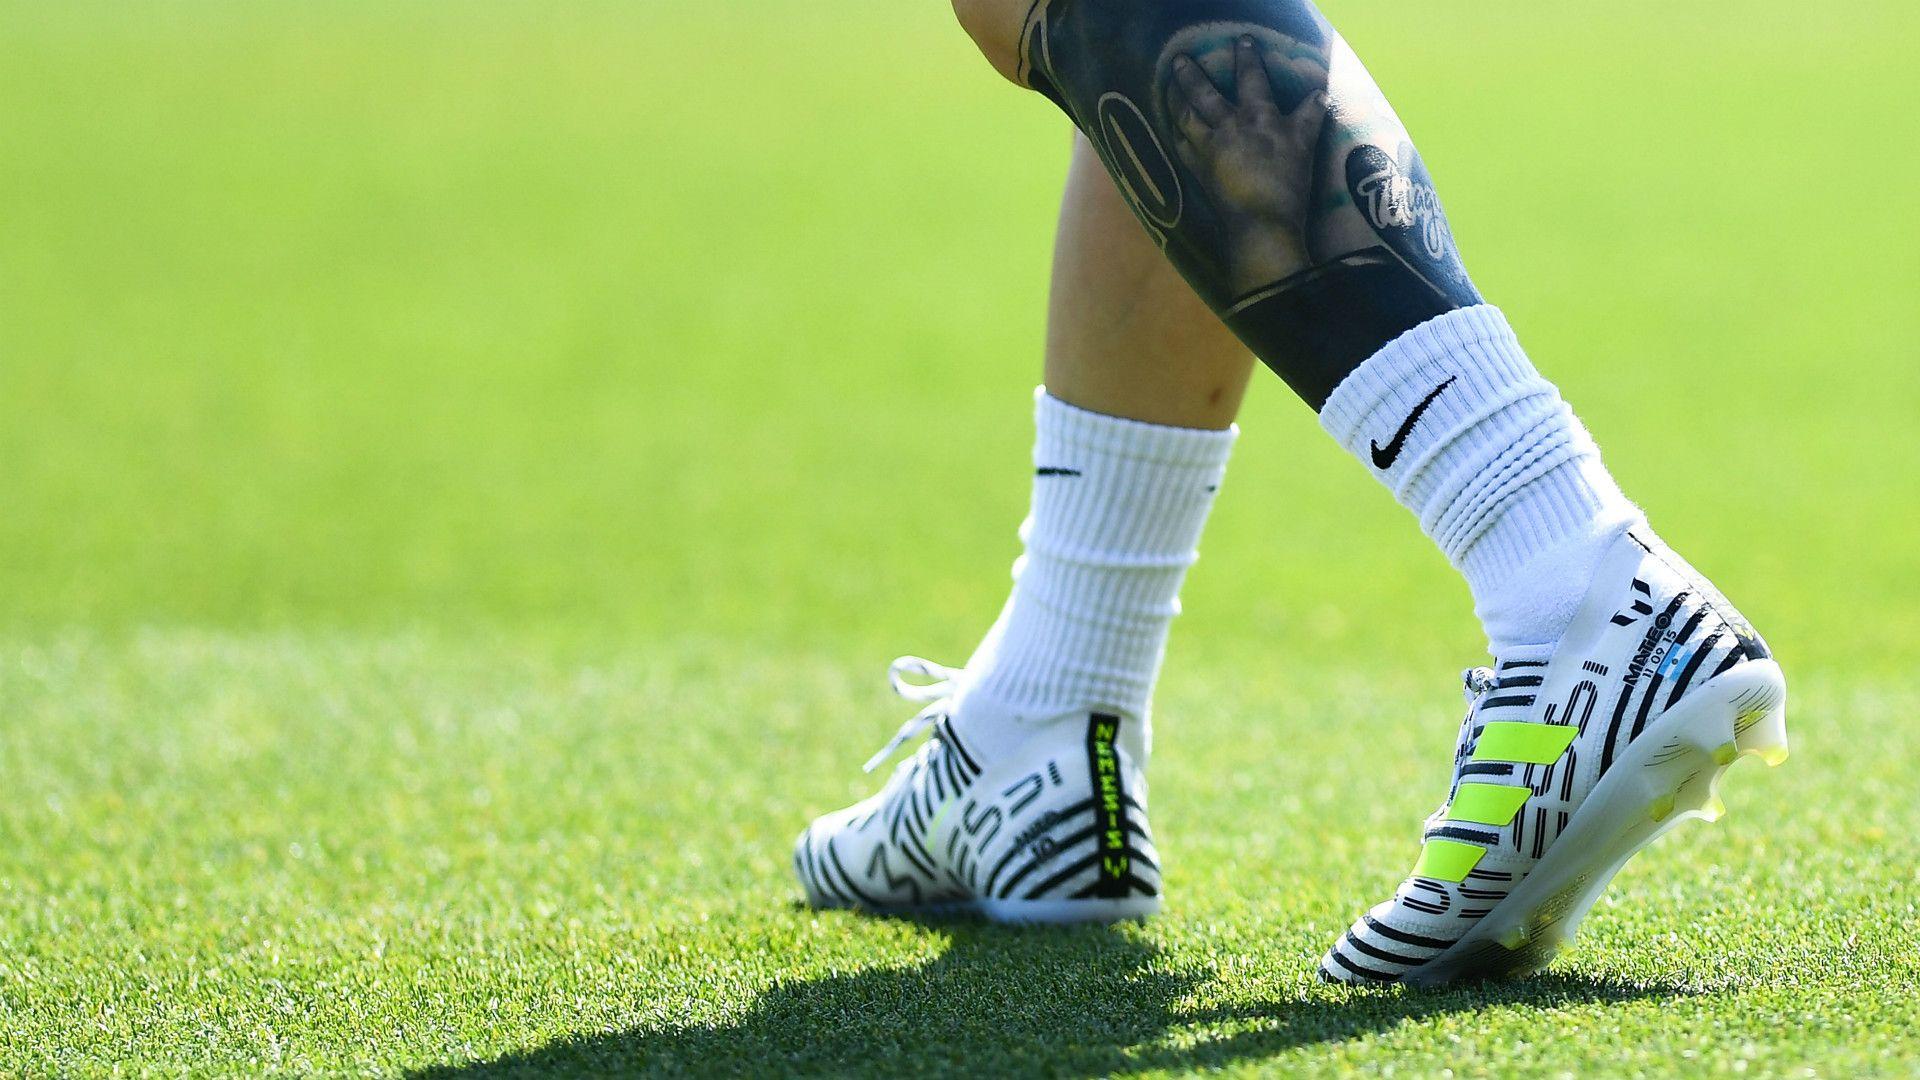 Adidas Nemeziz  Lionel Messi   Roberto Firmino among stars to wear ... 25ecbbcd432